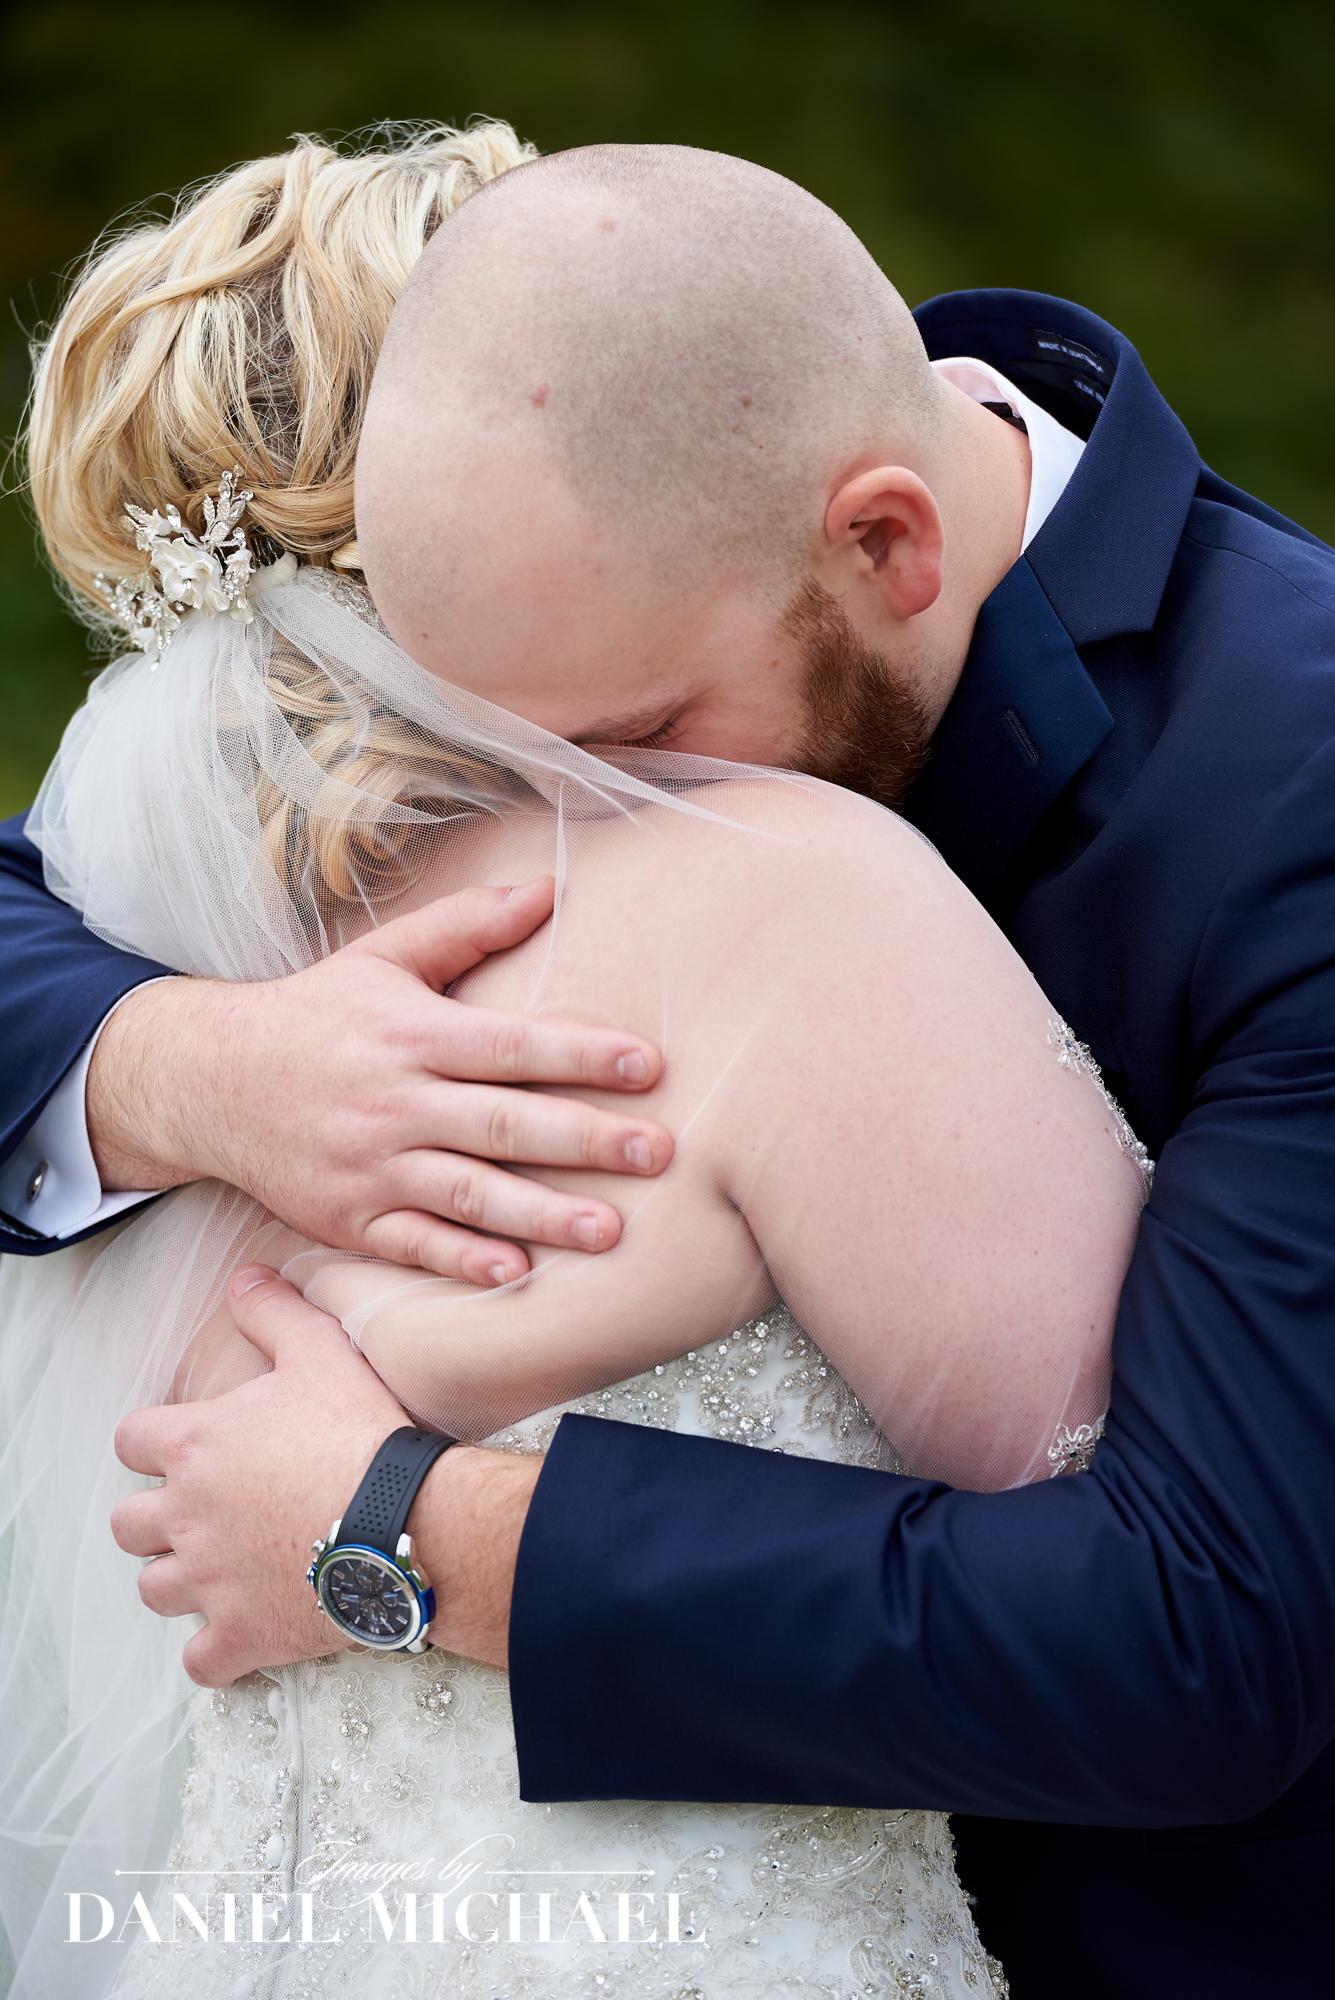 Find Wedding Photographers in Cincinnati Ohio